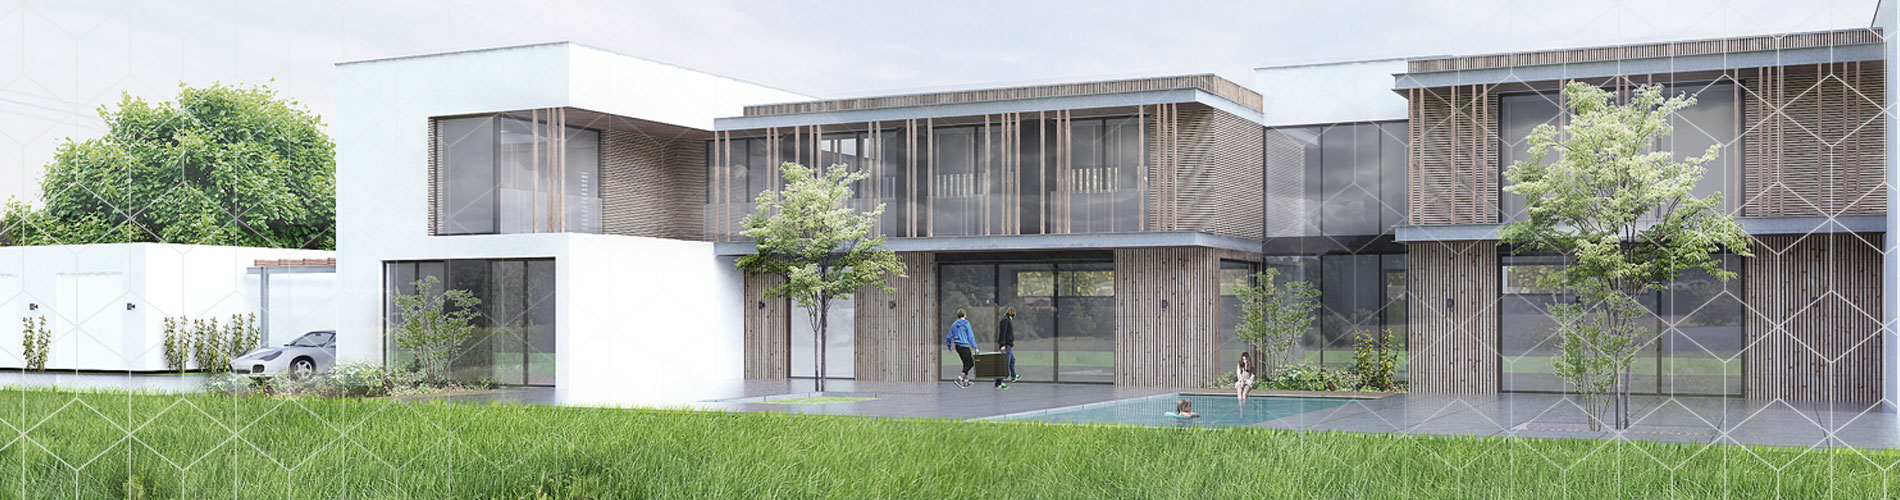 Maison Contemporaine Toit Terrasse actu-asb-architecte---maison-contemporaine-toit-terrasse